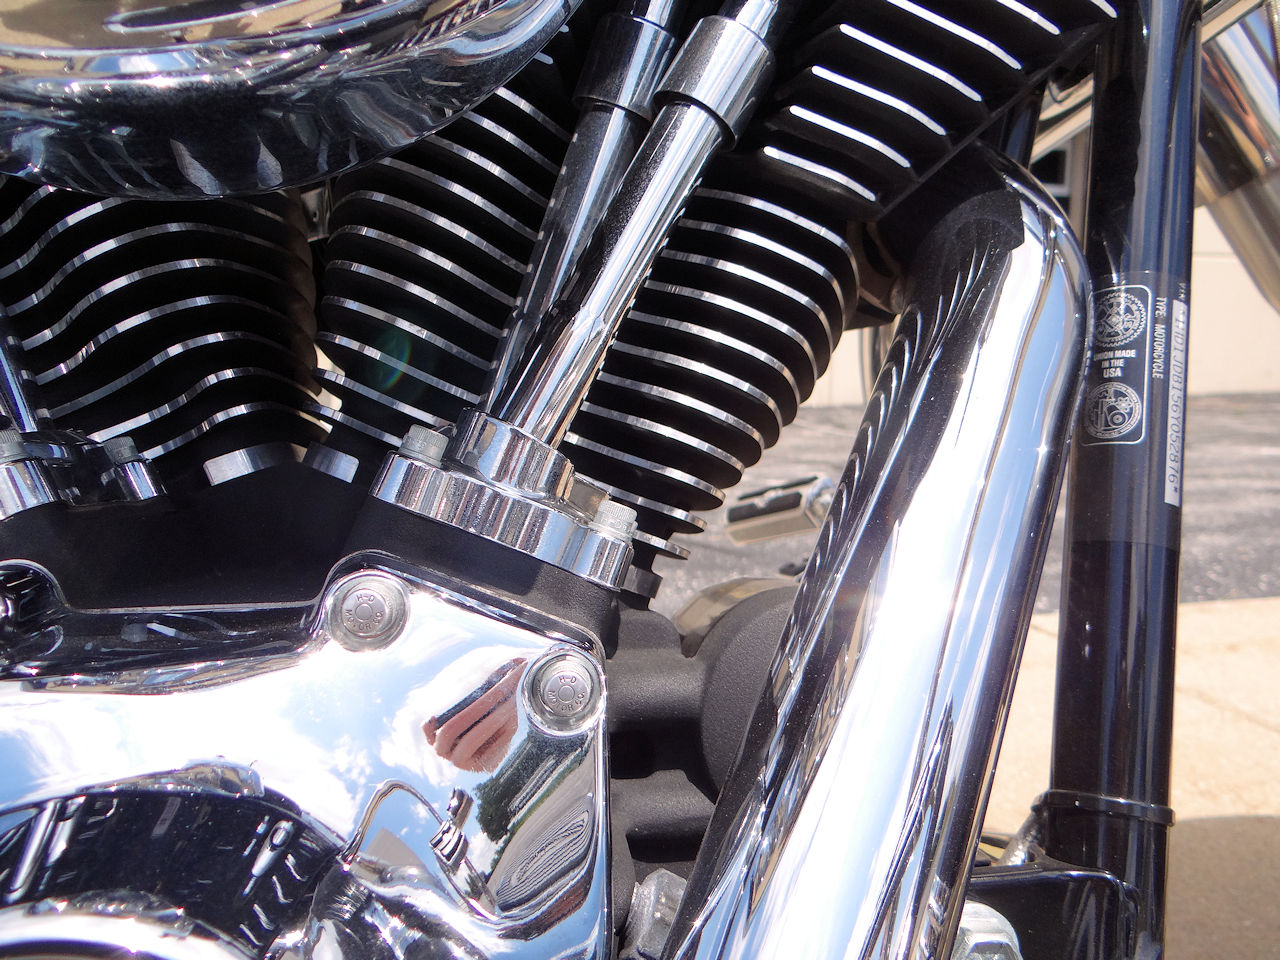 2006 Harley Davidson FLSTNI 84